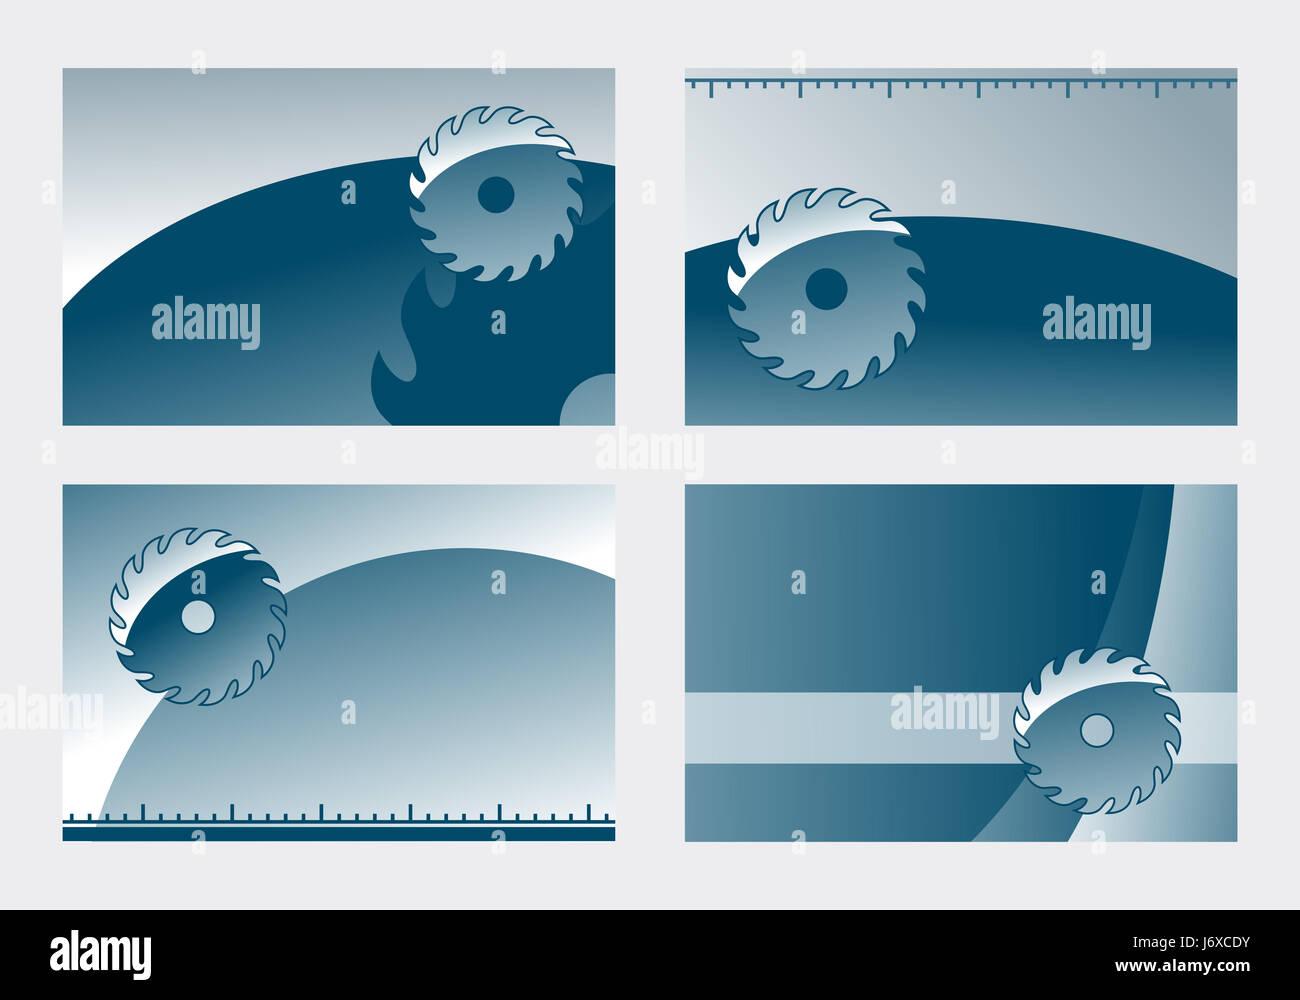 tool teeth illustration saw myth say circular saw visiting card joinery saw - Stock Image